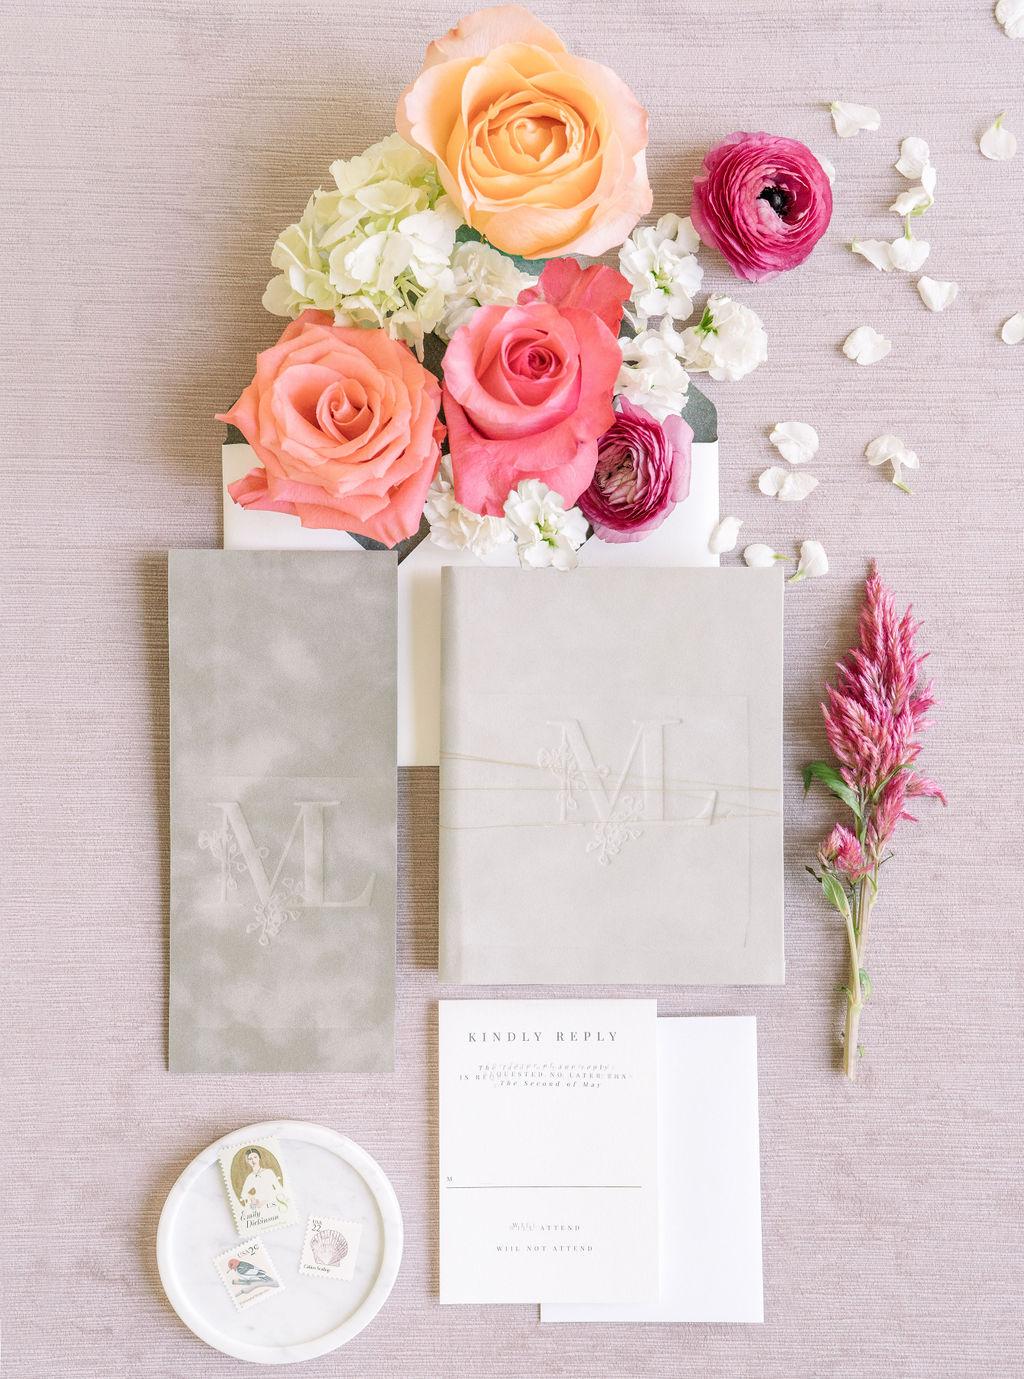 wedding invitations, Houston wedding invitations, luxury wedding invitations, wedding design, modern wedding, Martha weddings, Houston wedding planner, minimalist wedding, calligraphy, Houston calligrapher, modern calligraphy,